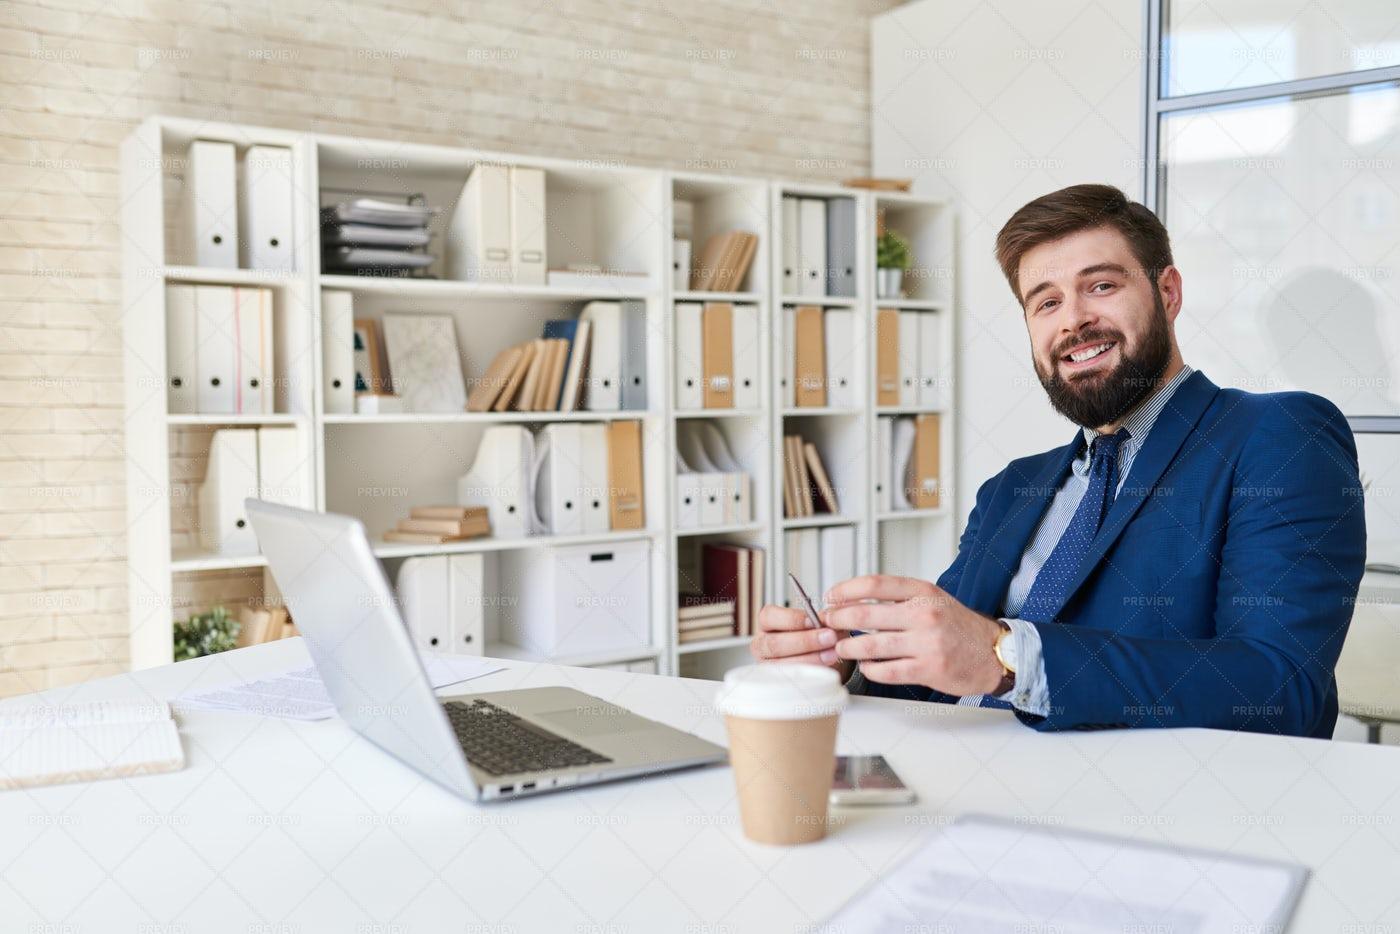 Smiling Businessman Posing At Desk...: Stock Photos